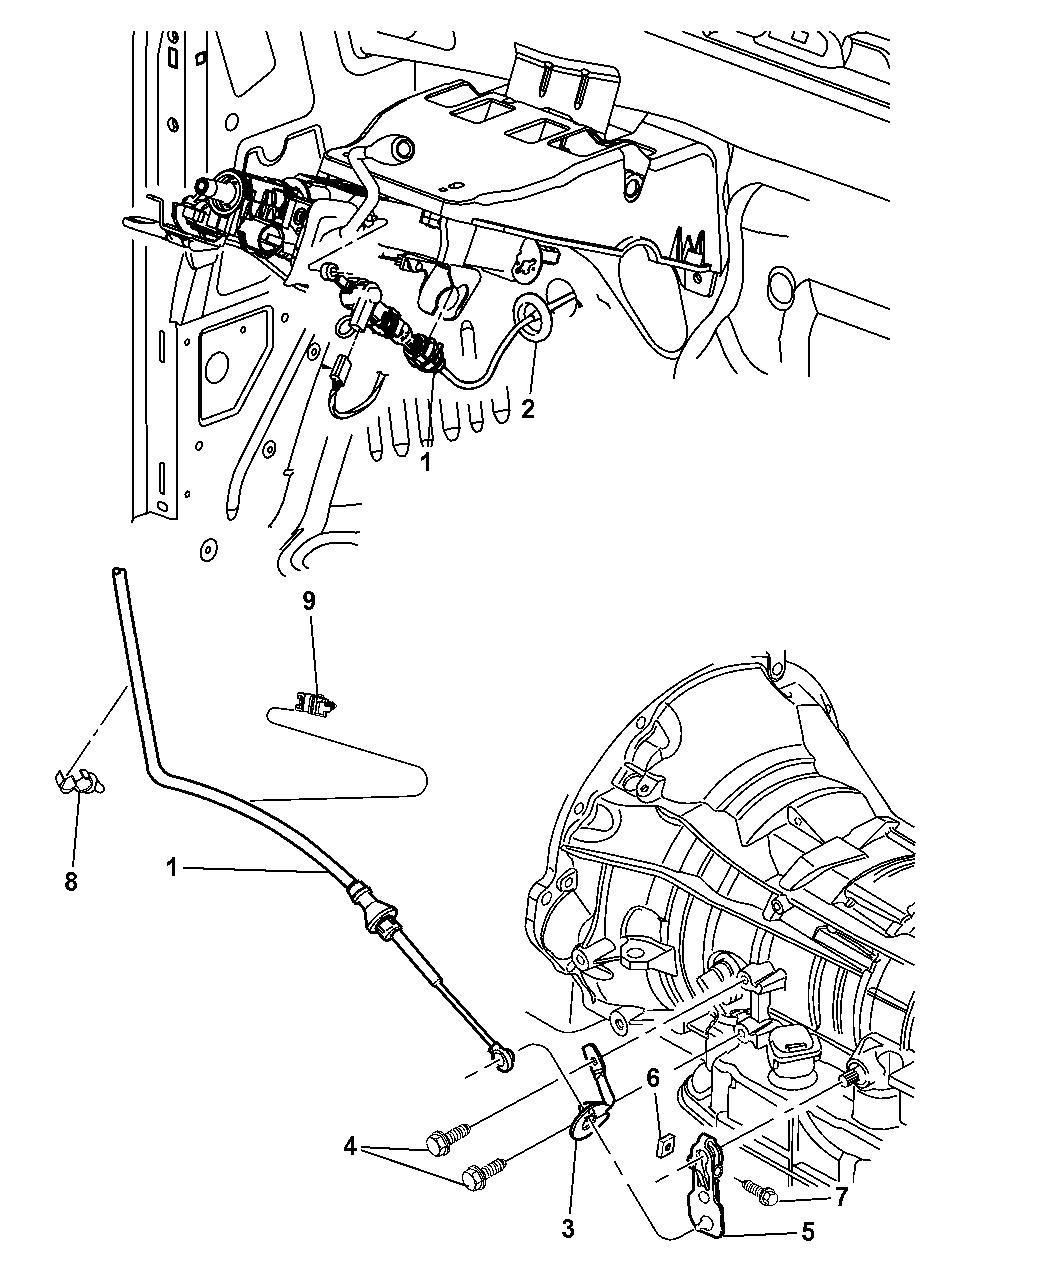 Wiring Diagram: 8 Dodge Ram Parts Diagram Service Manual